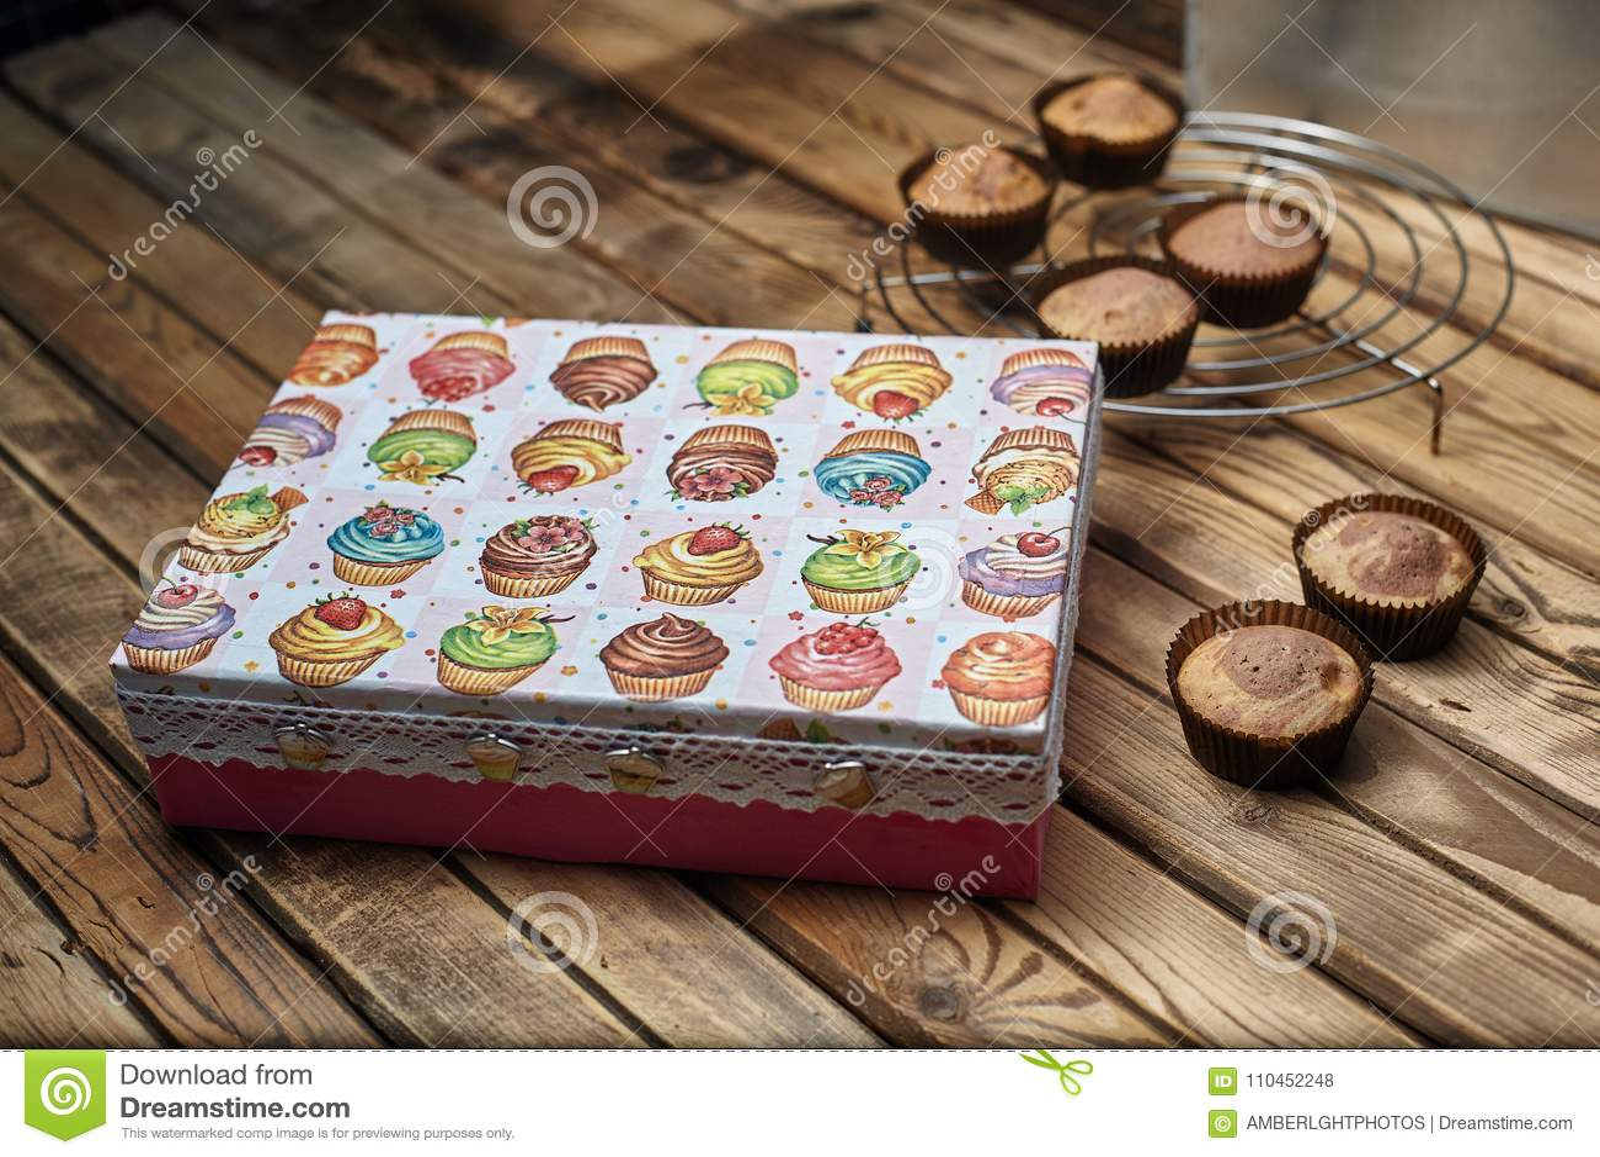 Muffin bredvid en gåvaask på en trätabell